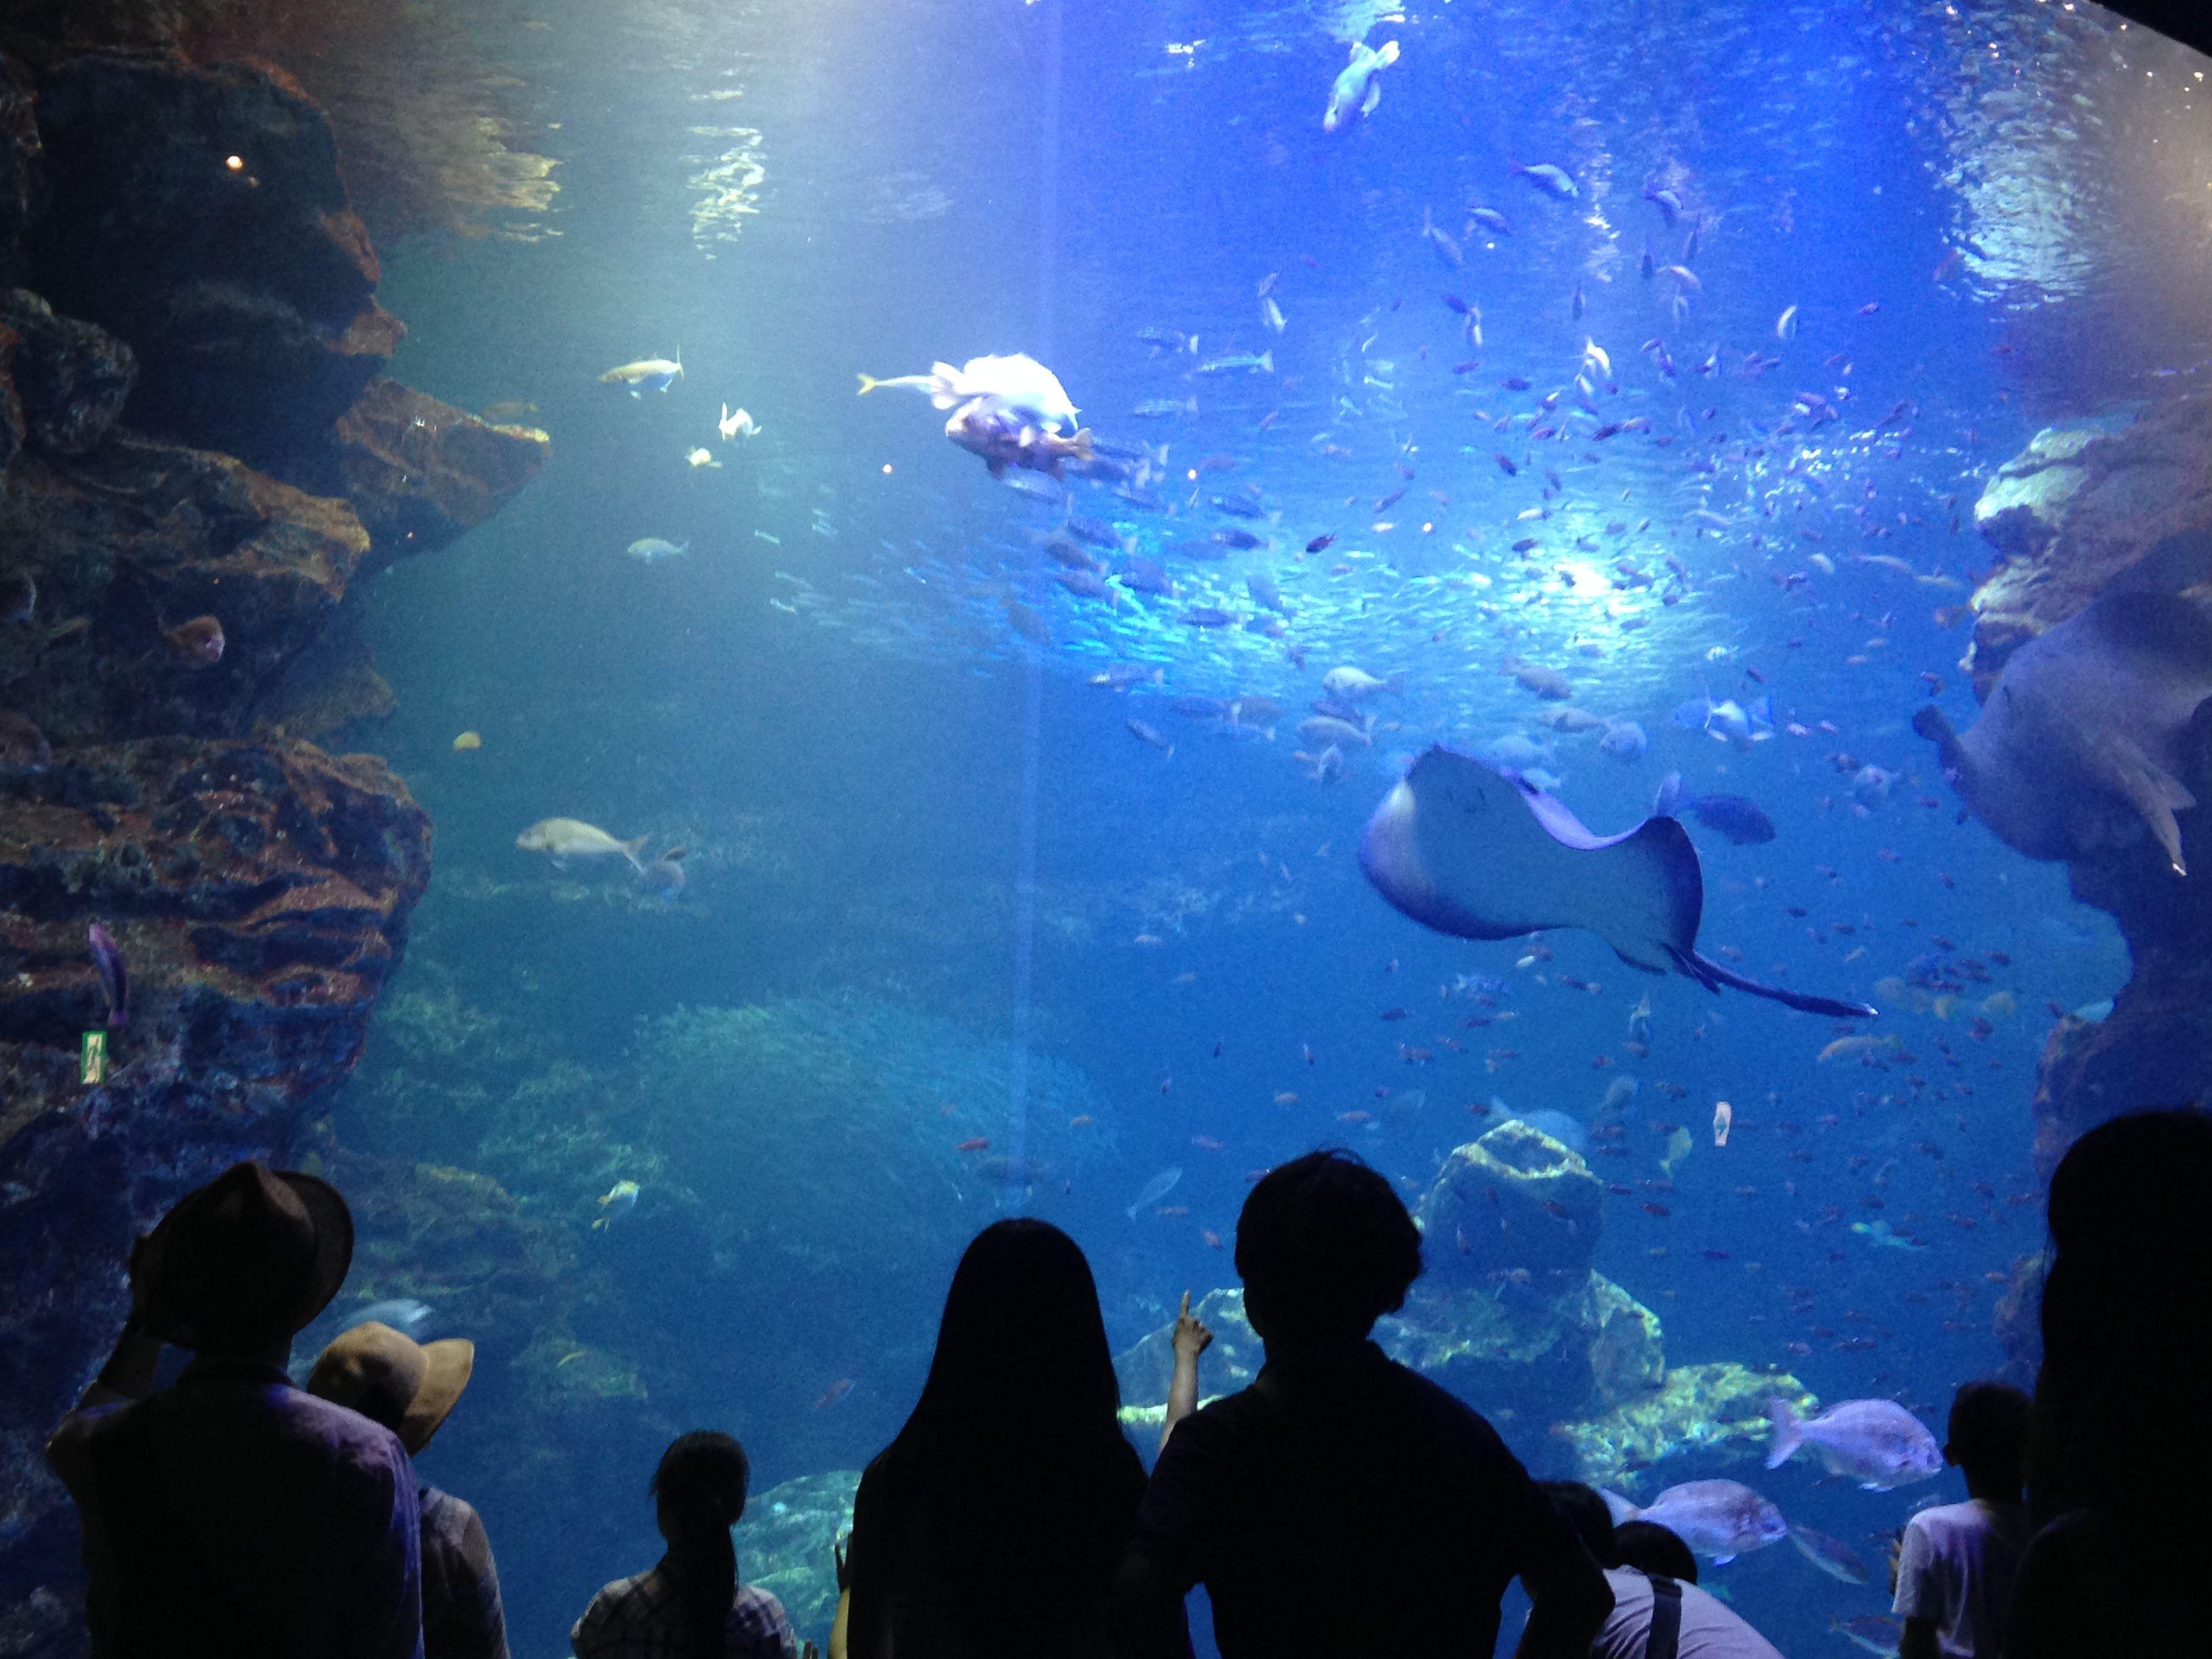 8d6e53db9d639da91e5ea951e85af8d8 Frais De Aquarium Osaka Concept